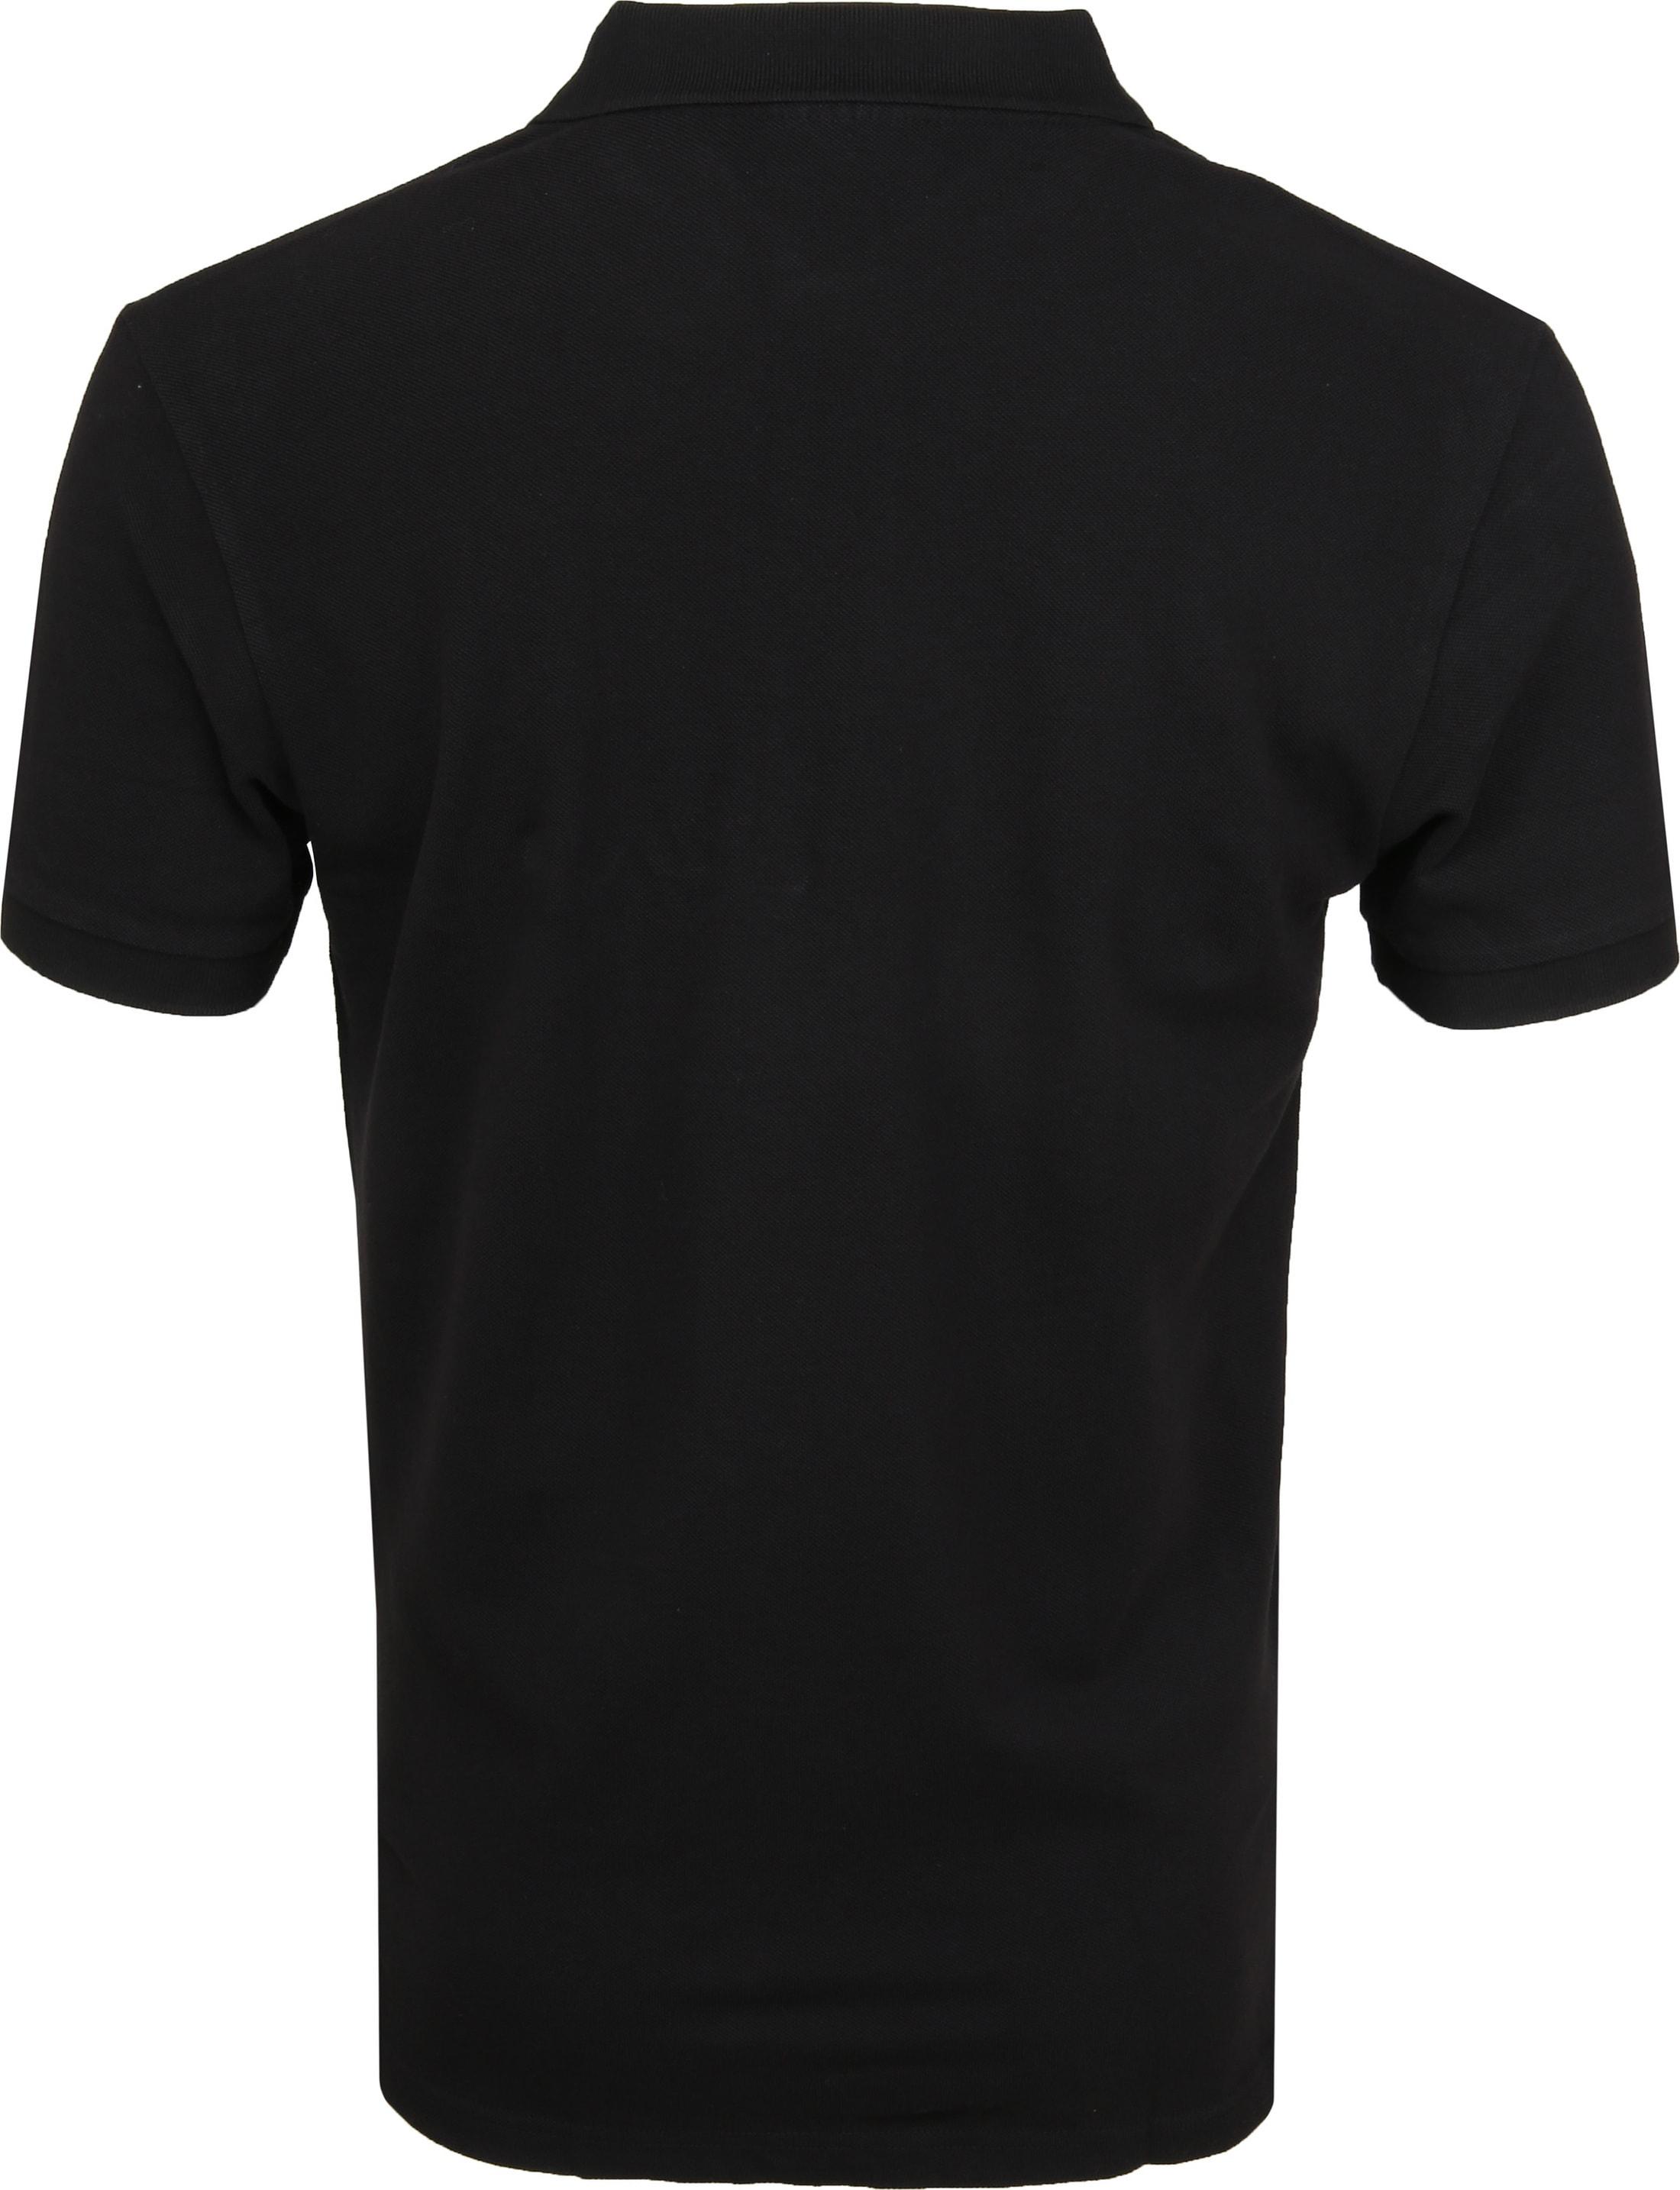 Profuomo Short Sleeve Poloshirt Schwarz foto 3